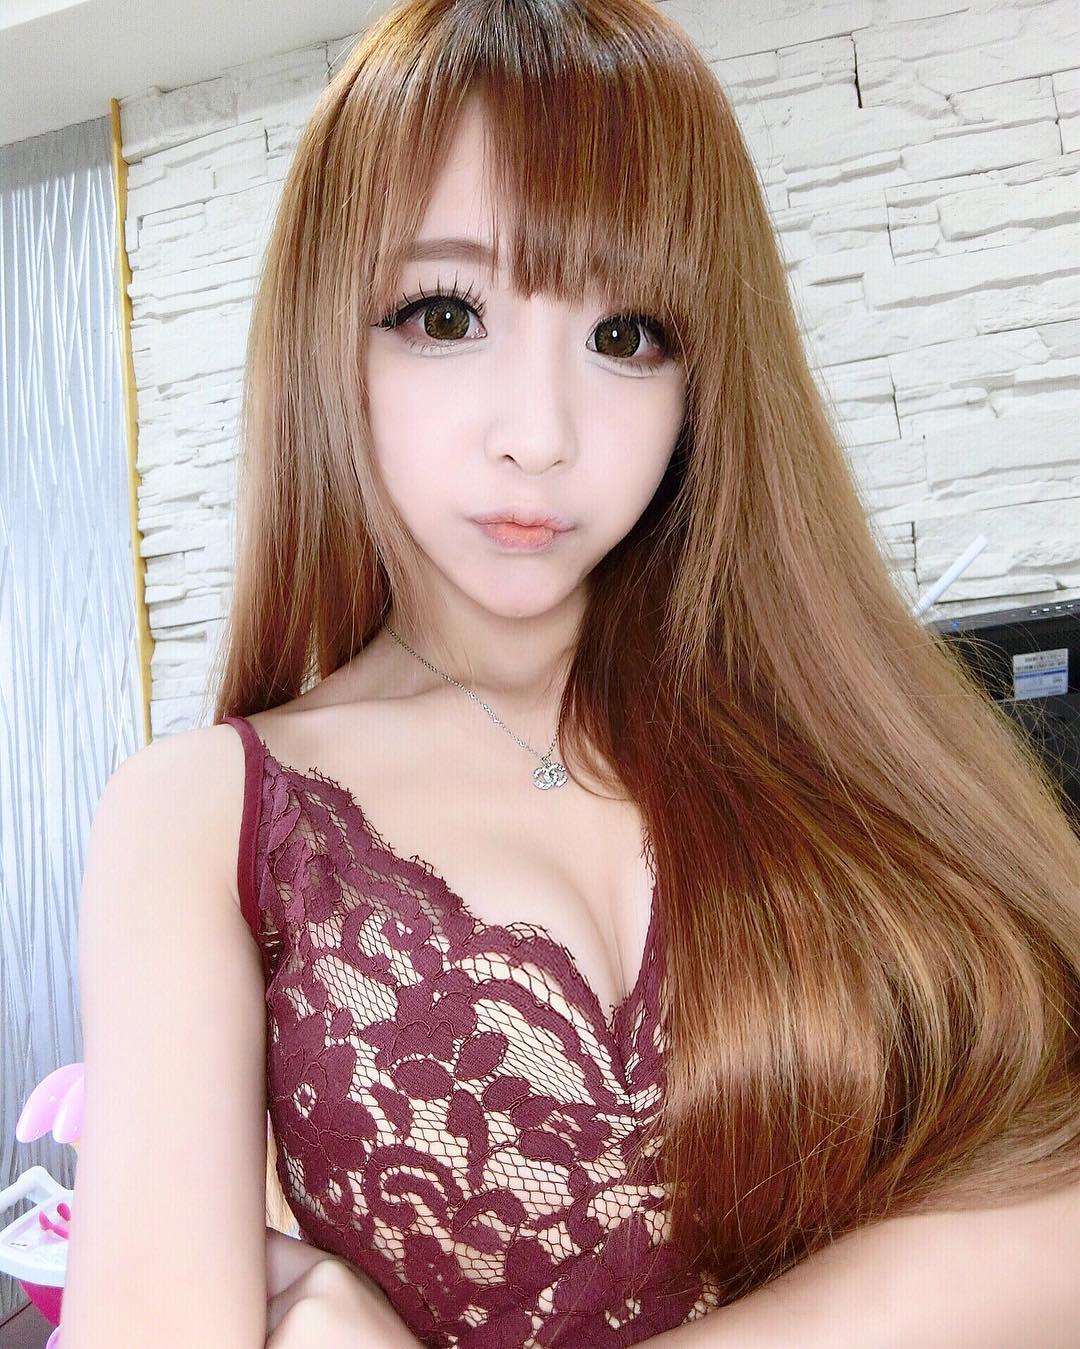 lkk_chu_15876414_244381535986549_4216068974405746688_n